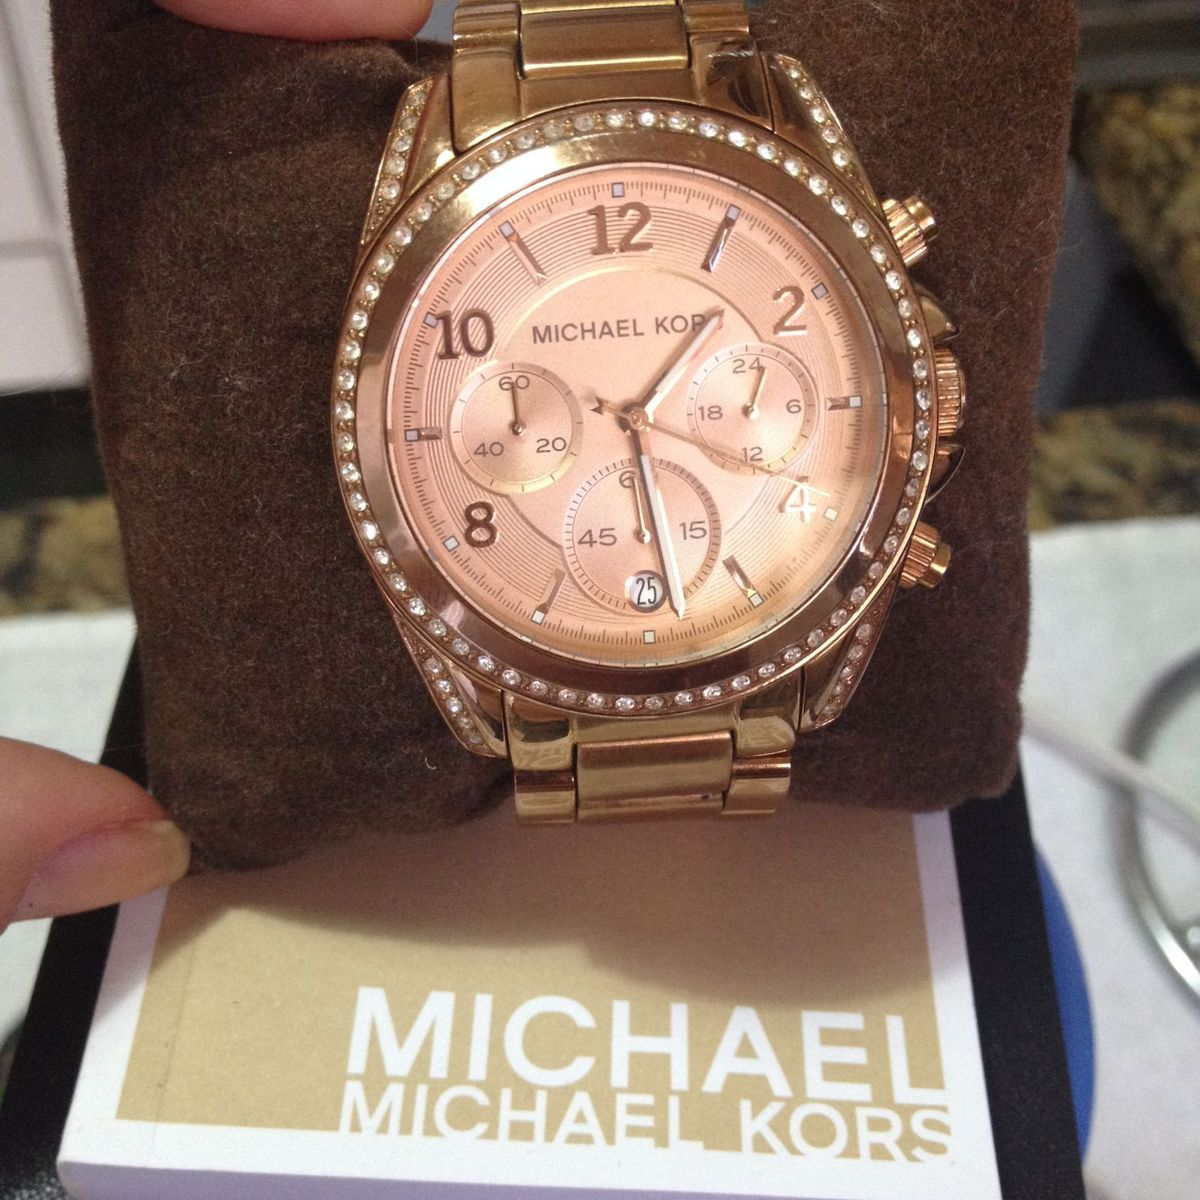 43aca7d26d0e4 1 Relógio Michael Kors Rosê Mk 5263   Relógio Feminino Michael Kors ...